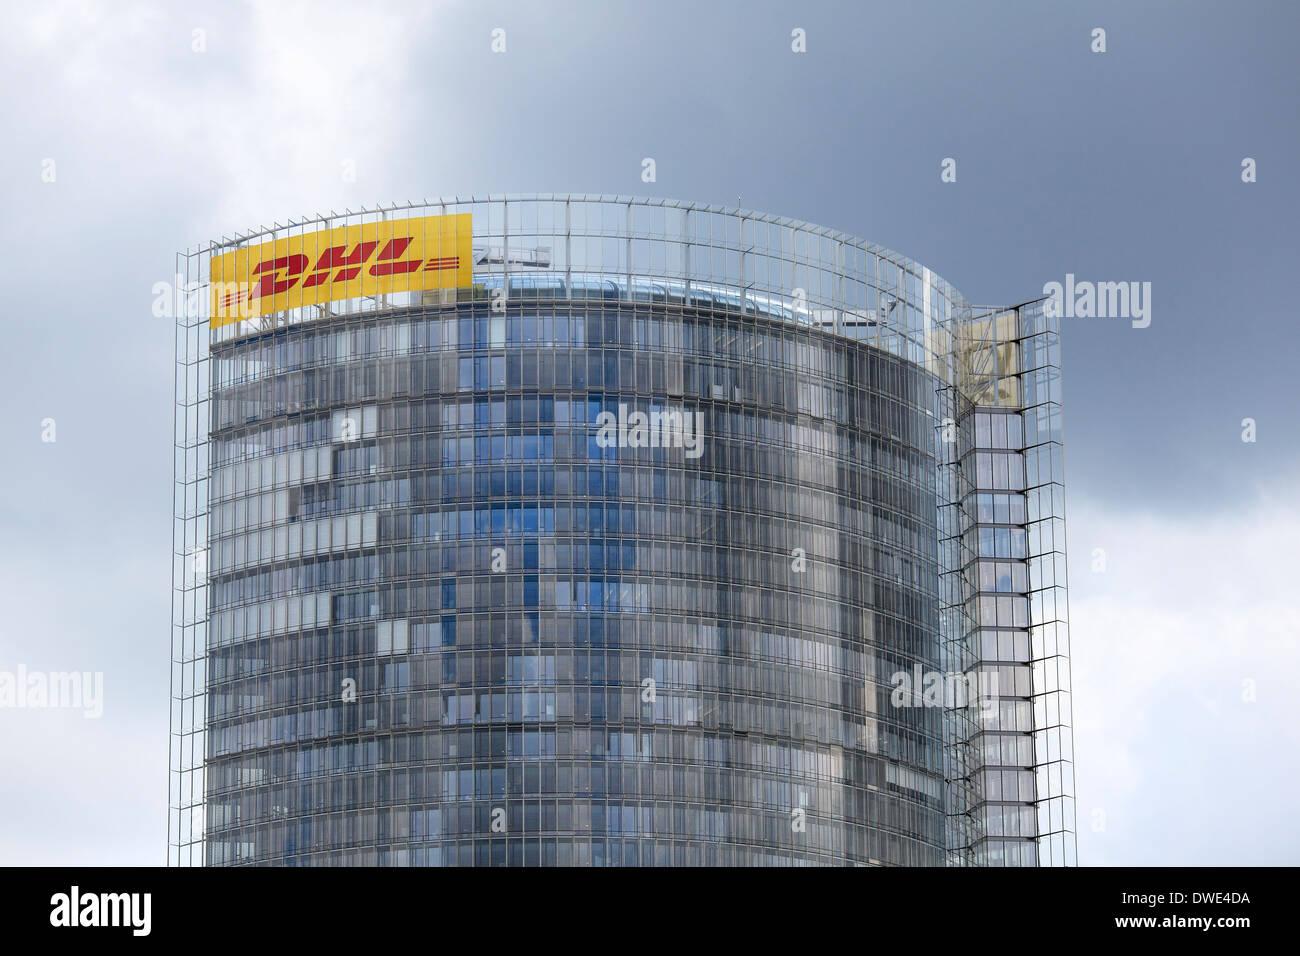 Post Tower building, Deutsche Post DHL headquarters, Bonn, Germany. Stock Photo